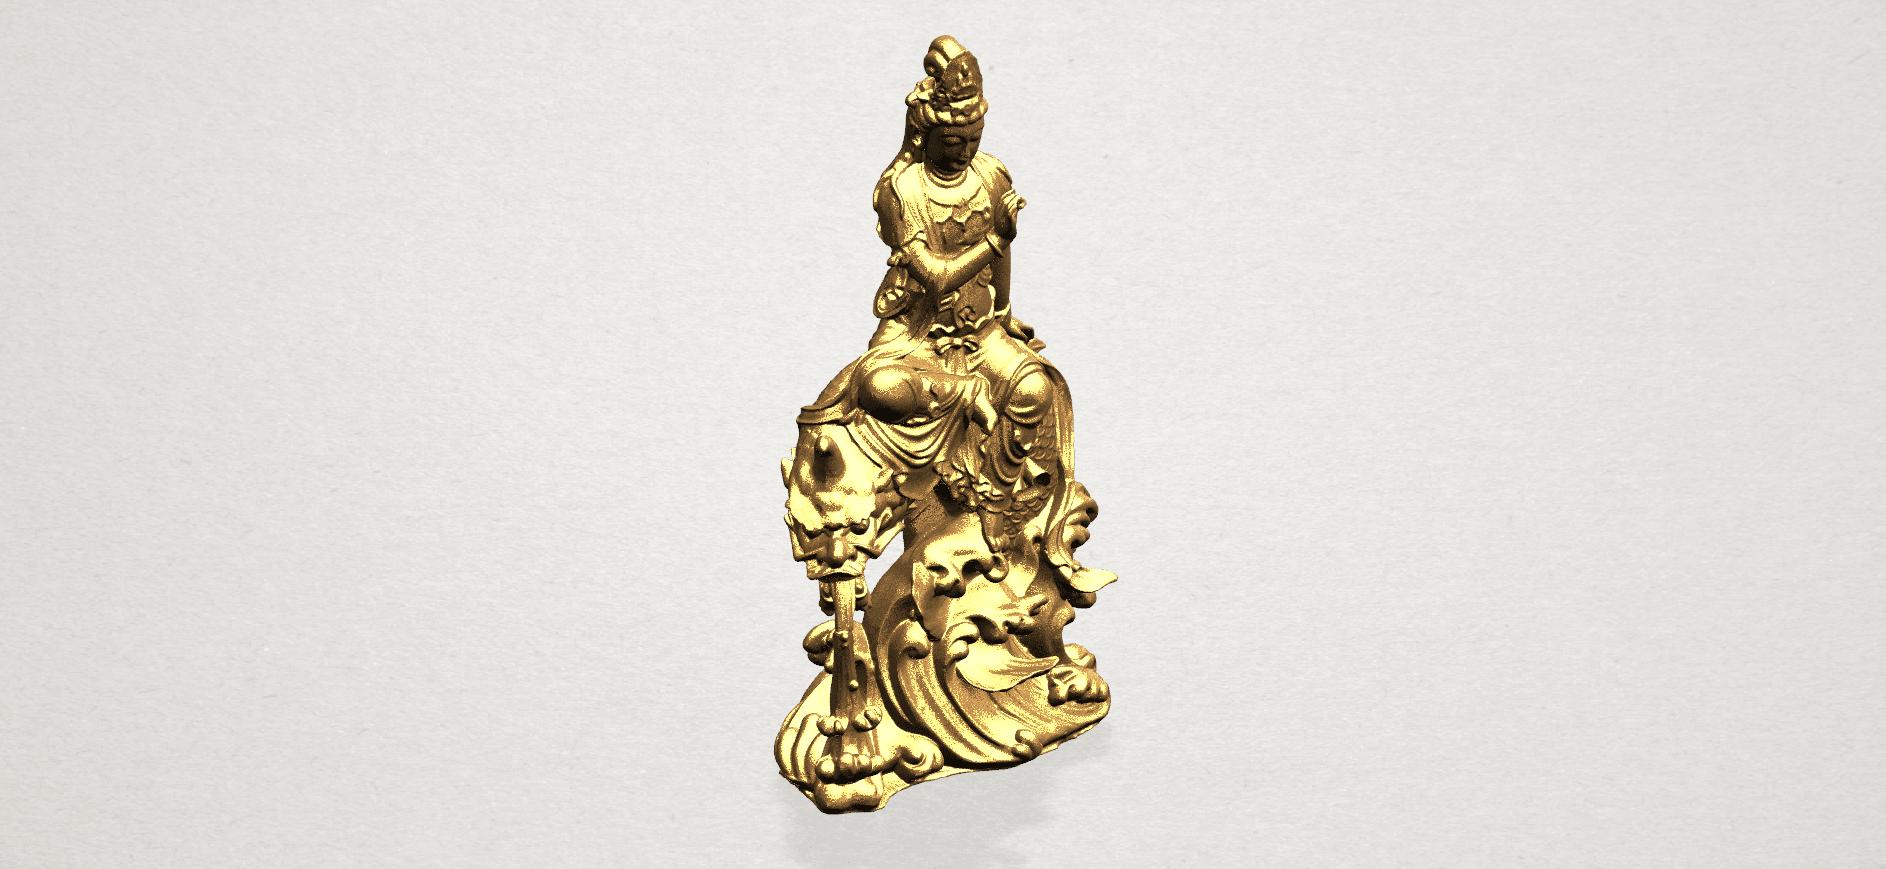 Avalokitesvara Bodhisattva (with fish) 88mm - A08.png Télécharger fichier 3DS gratuit Avalokitesvara Bodhisattva (avec poisson) 01 • Modèle imprimable en 3D, GeorgesNikkei